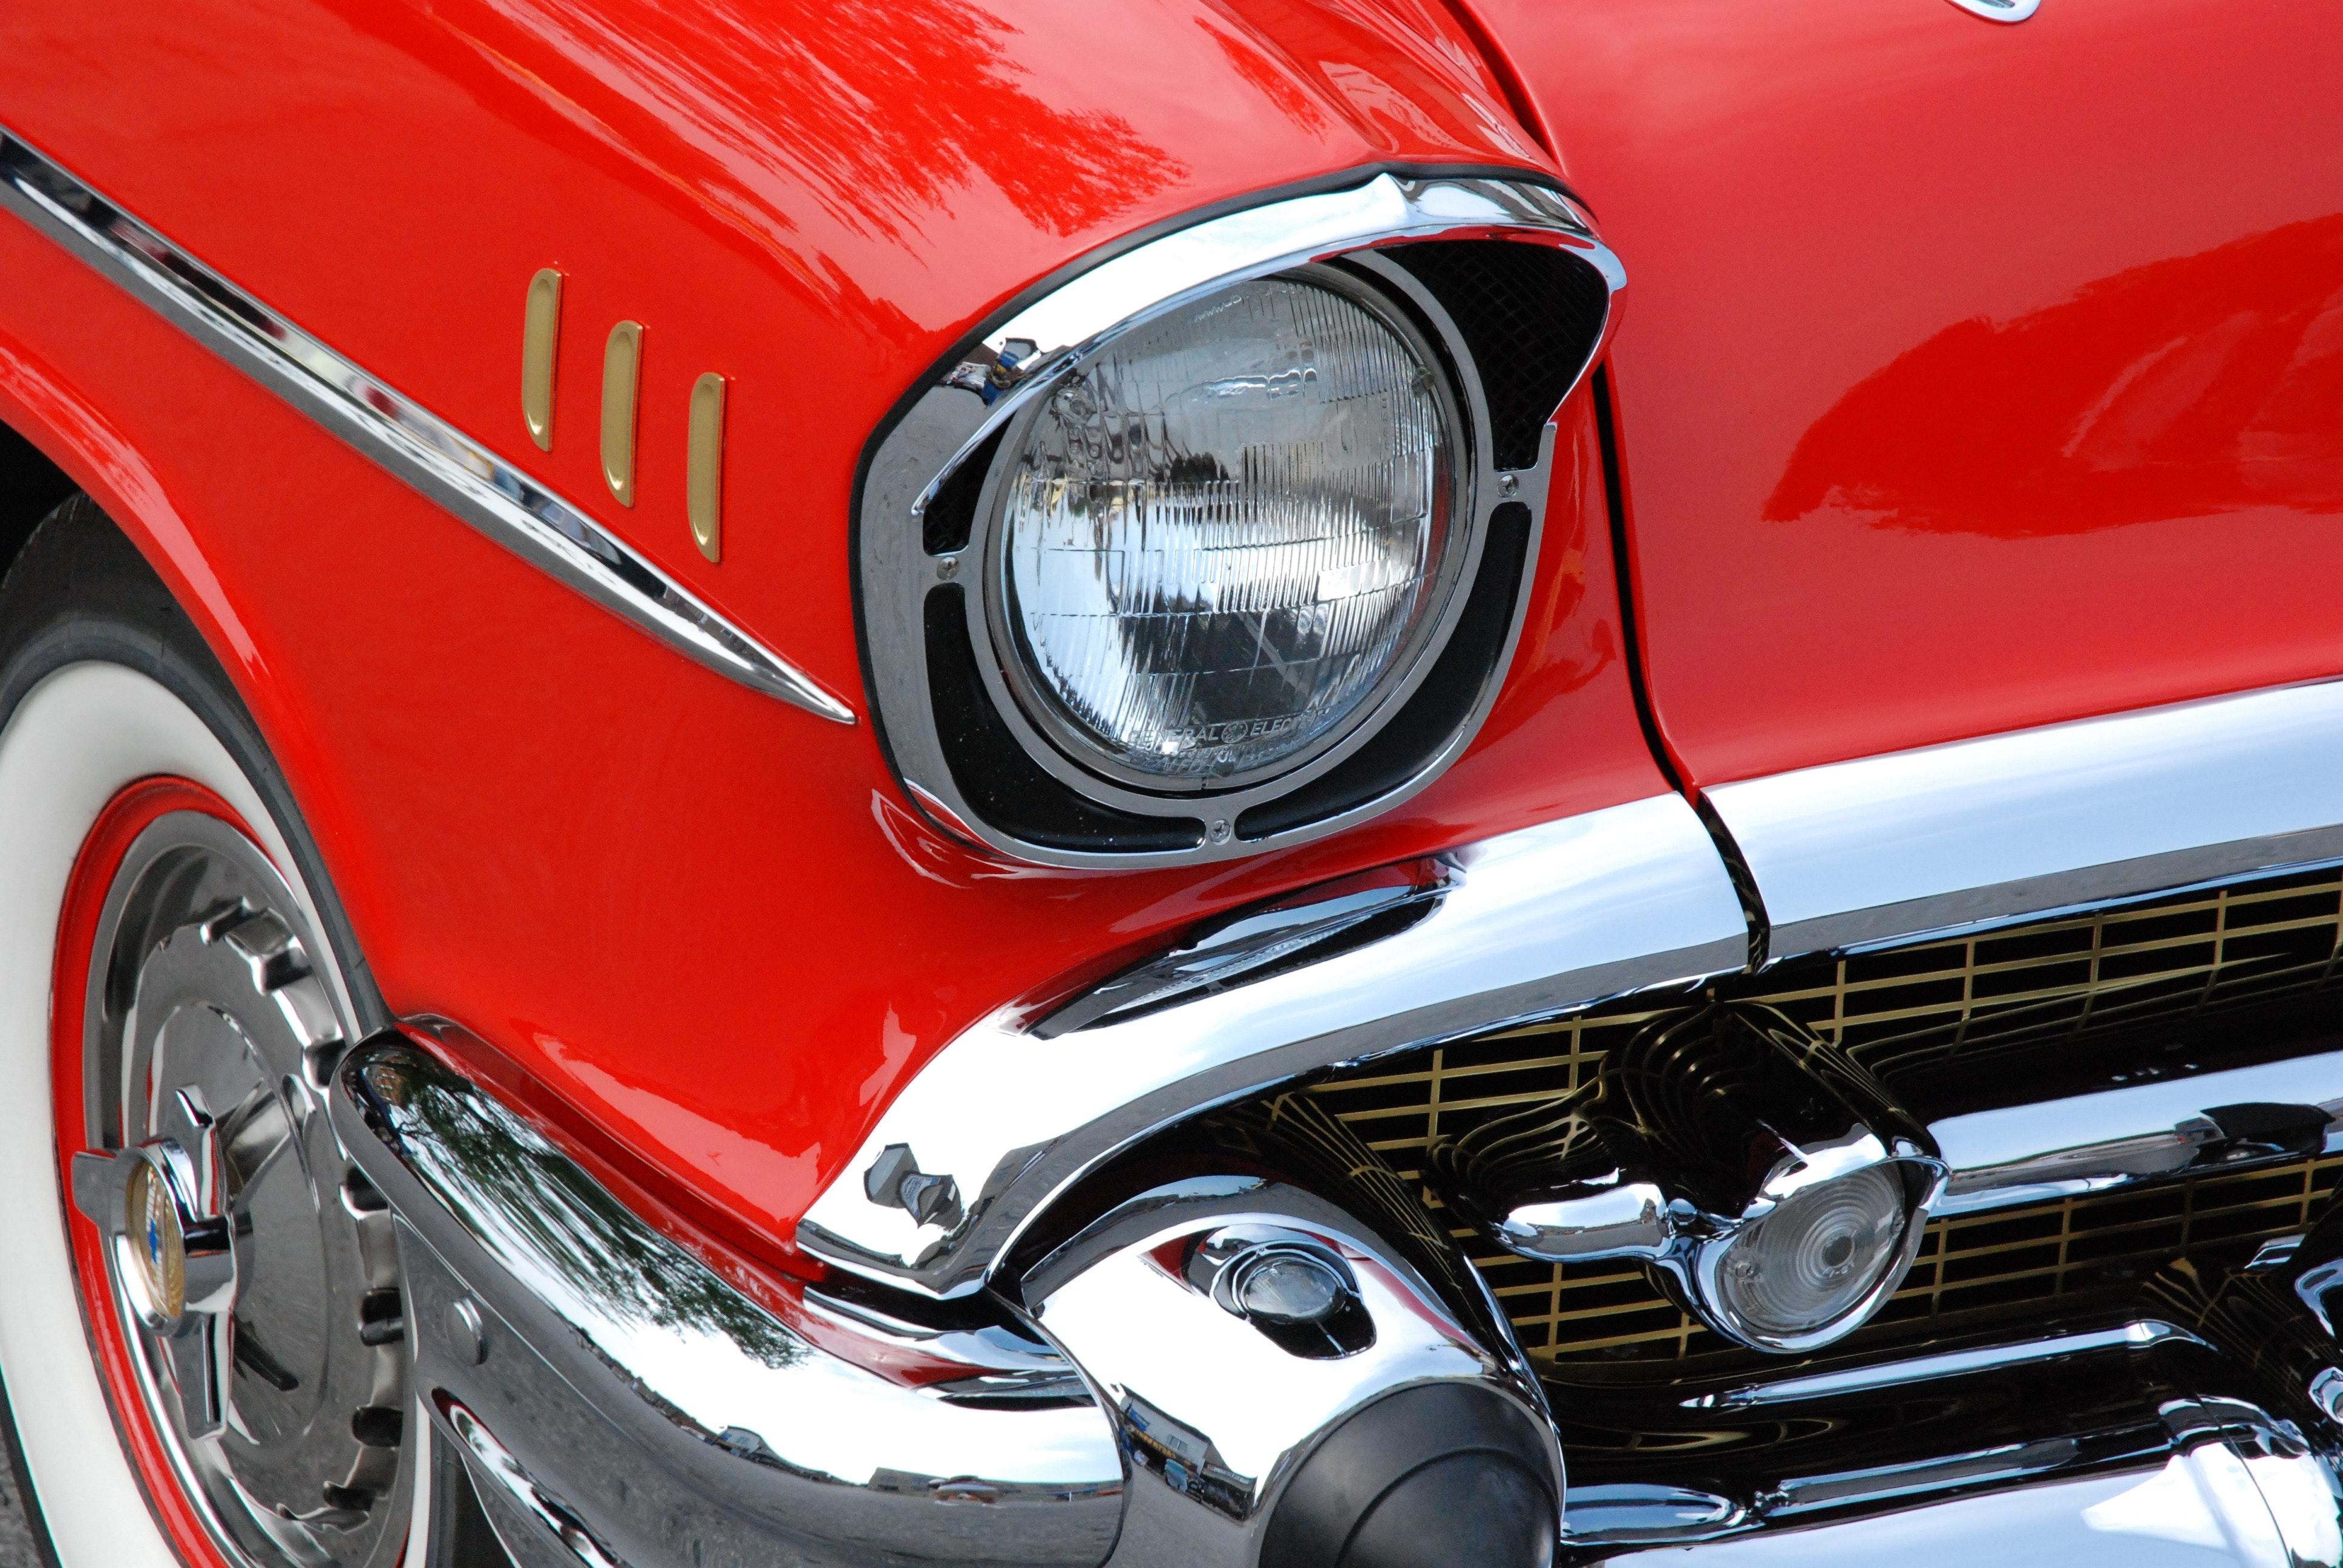 American Legion Bike and Car Shows – May Thru September!